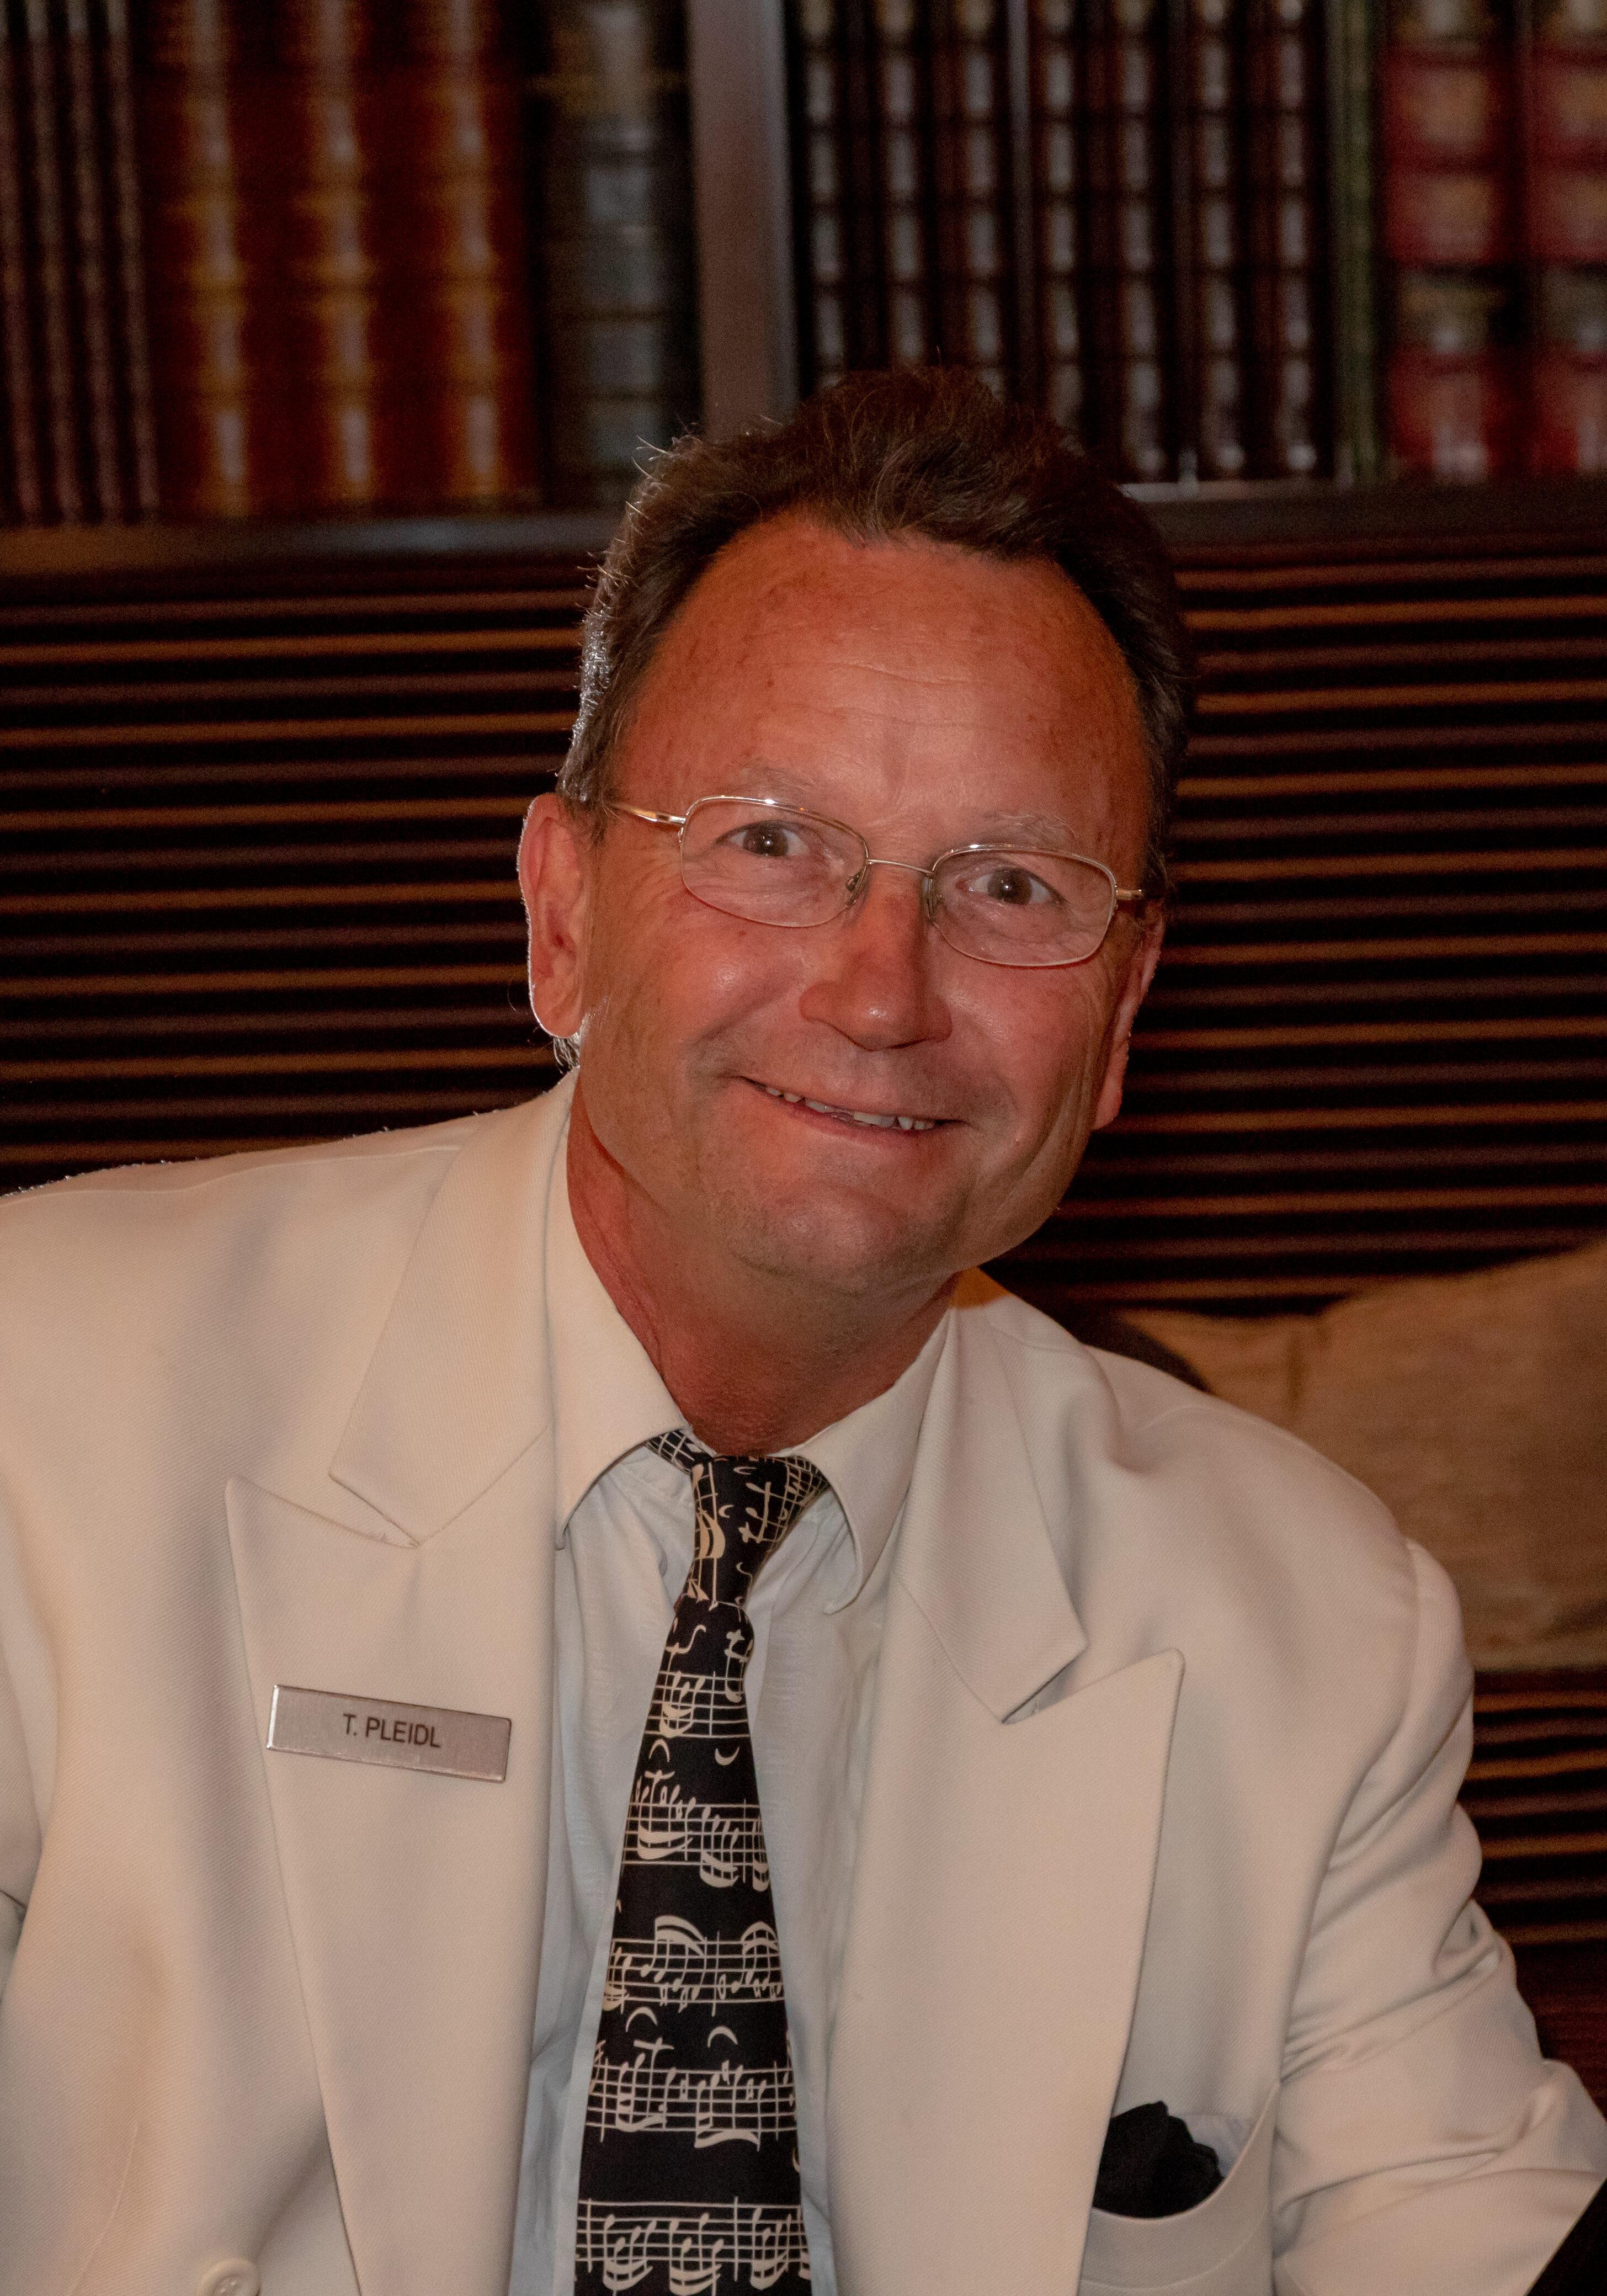 Wiener Bar Pianist Thomas Pleidl im Hotel Imperial Wien